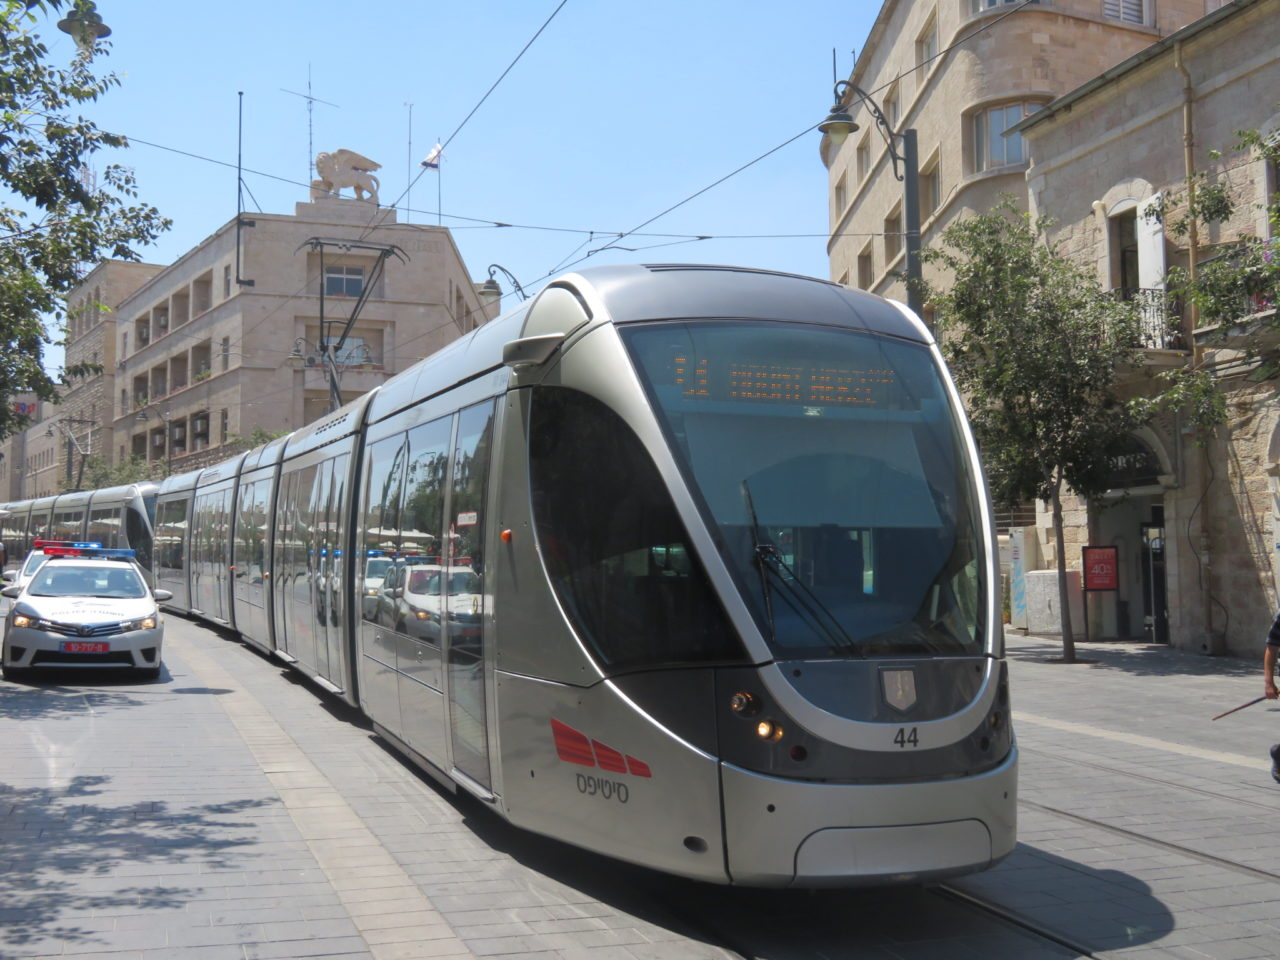 The joys of walking Jerusalem - Jerusalem has a modern network of trams, buses, taxis